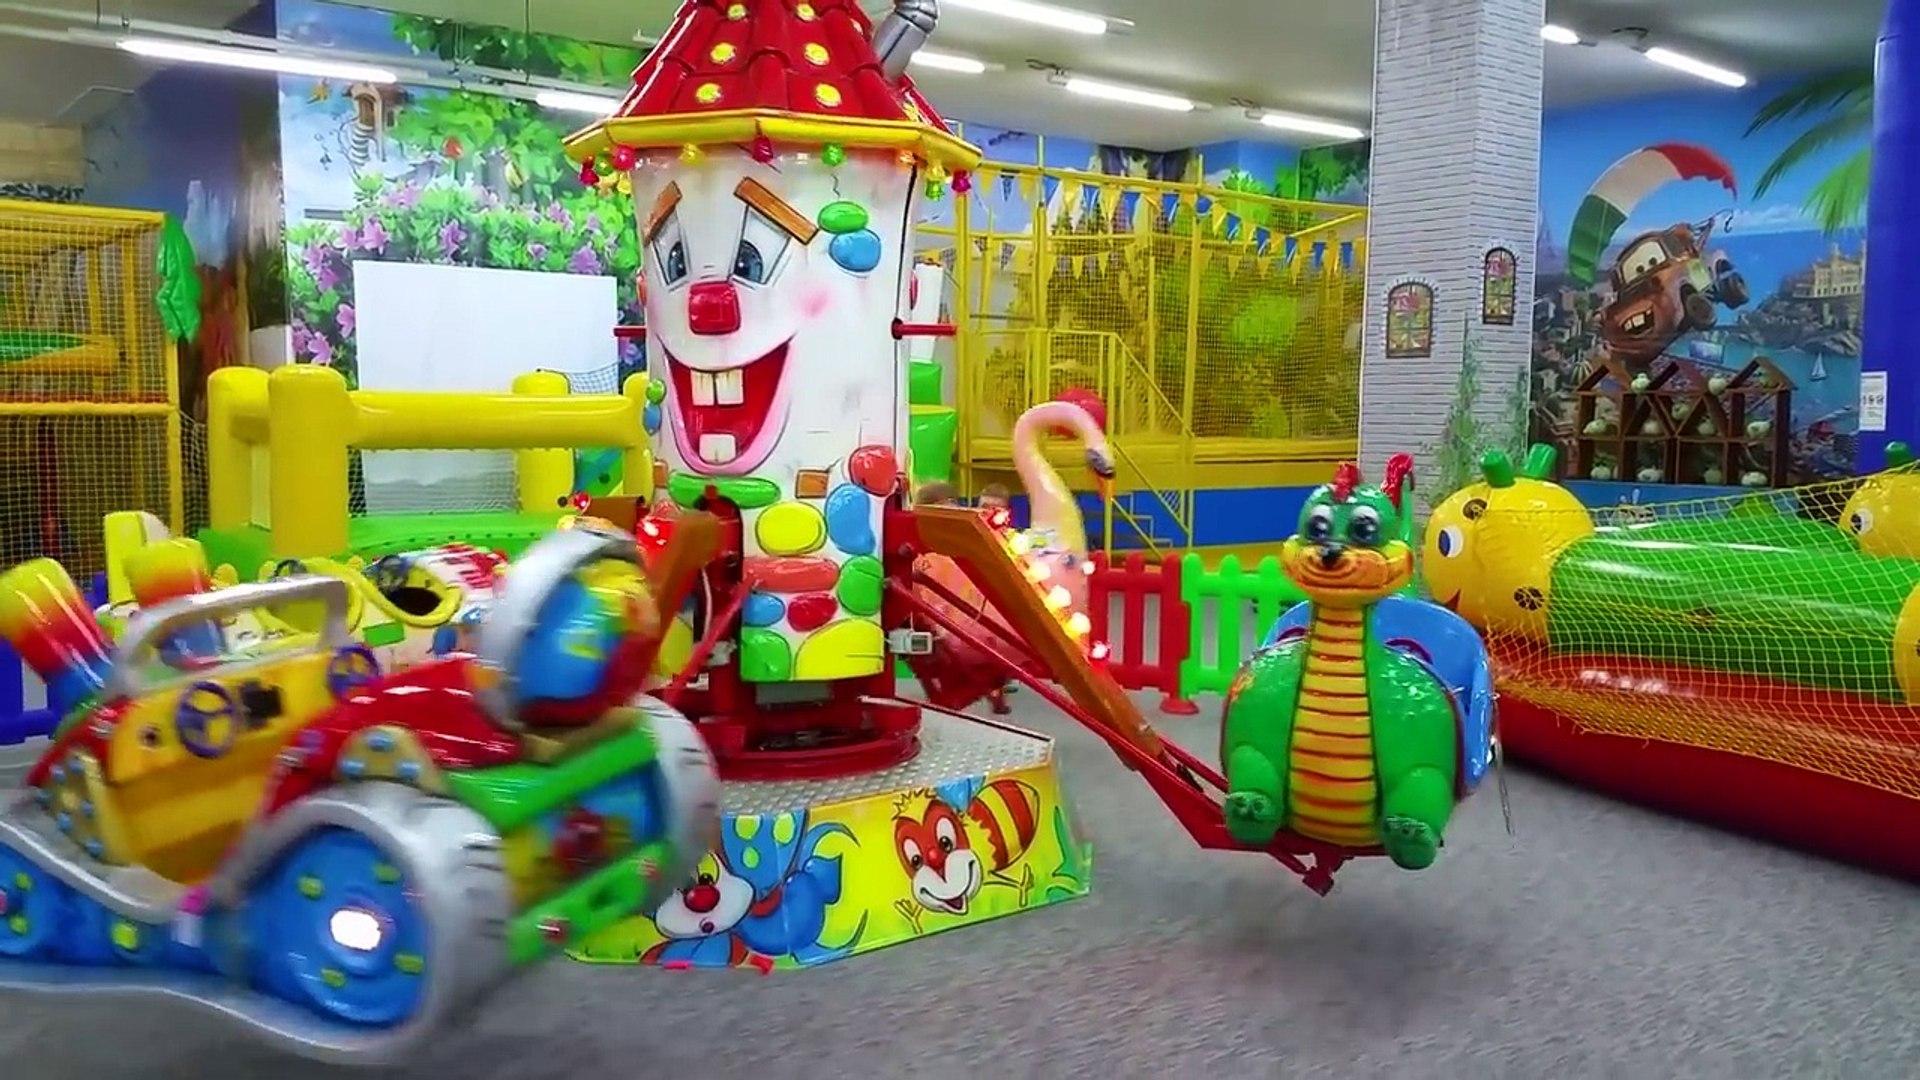 KIDS FUN CENTER entertainment center for kids from Nastushik maze inflatable slides, carousel